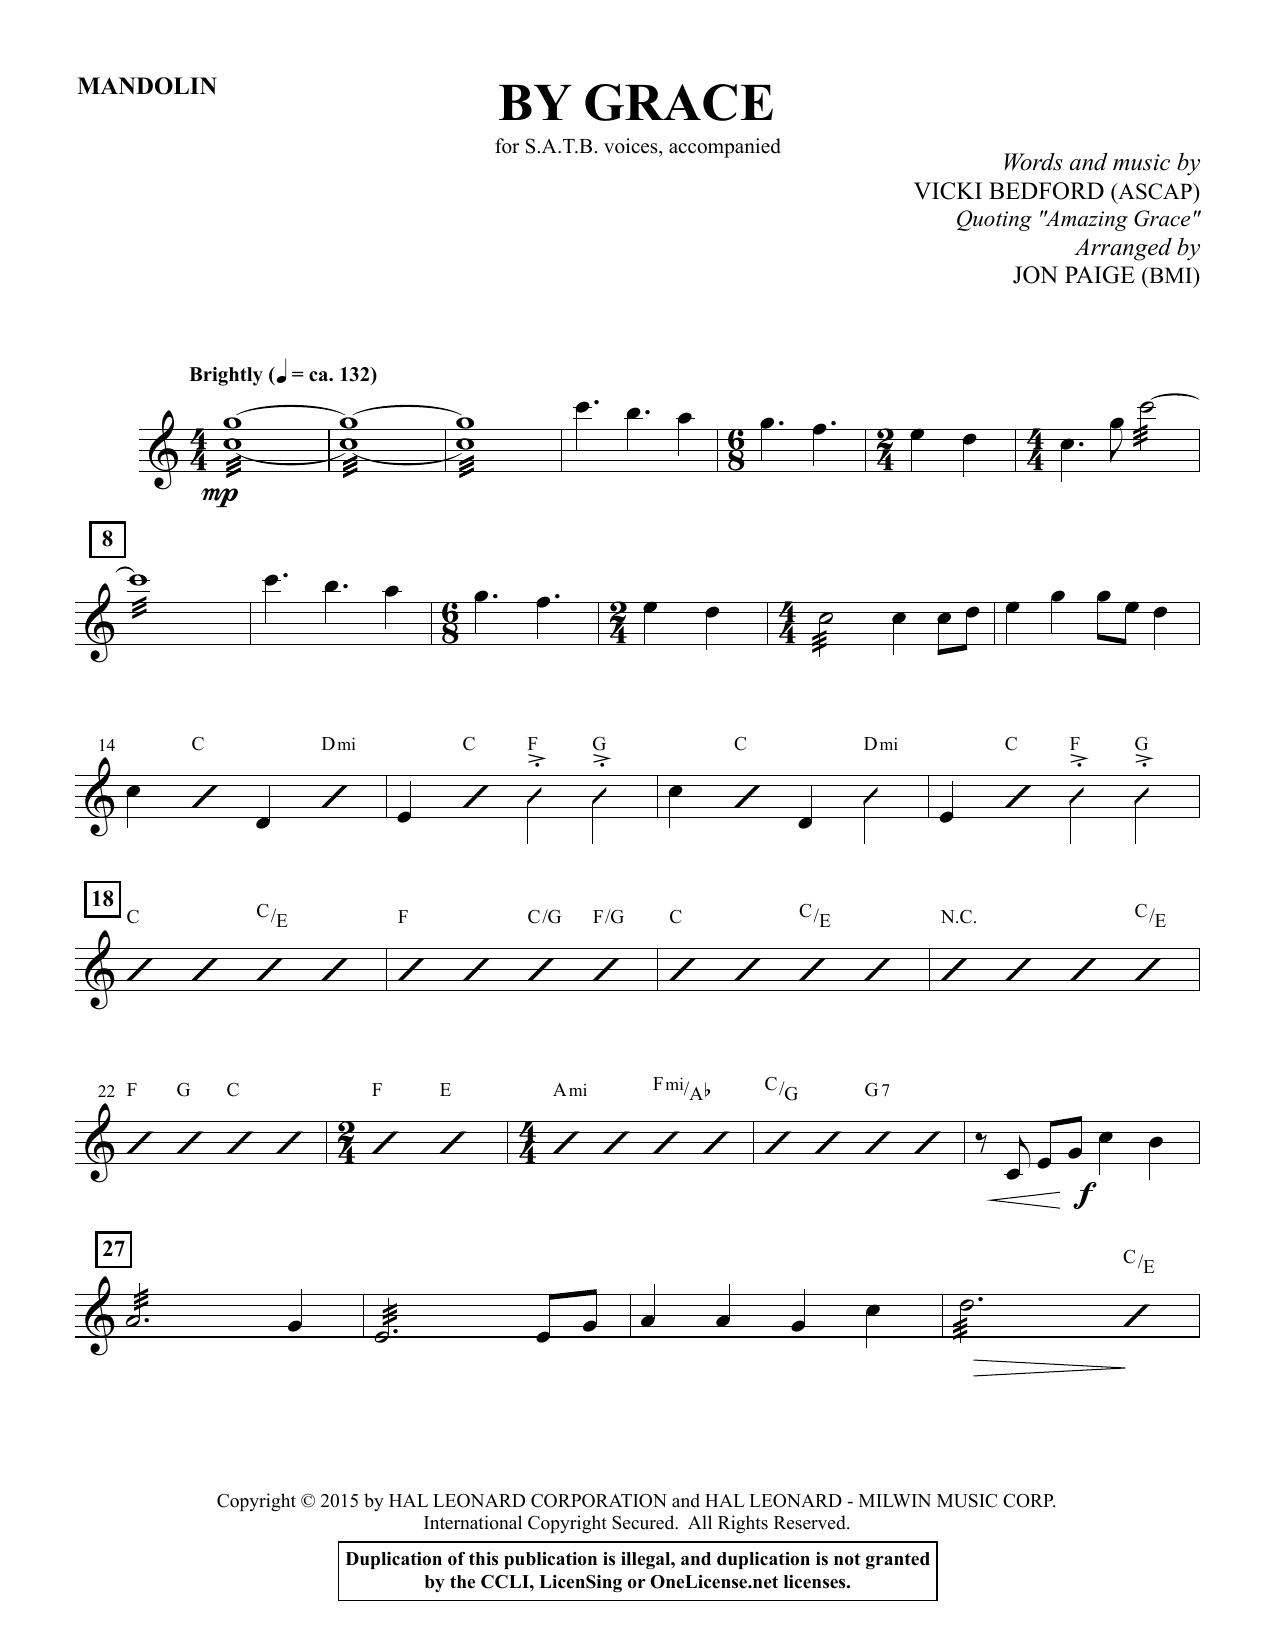 By Grace - Fiddle sheet music